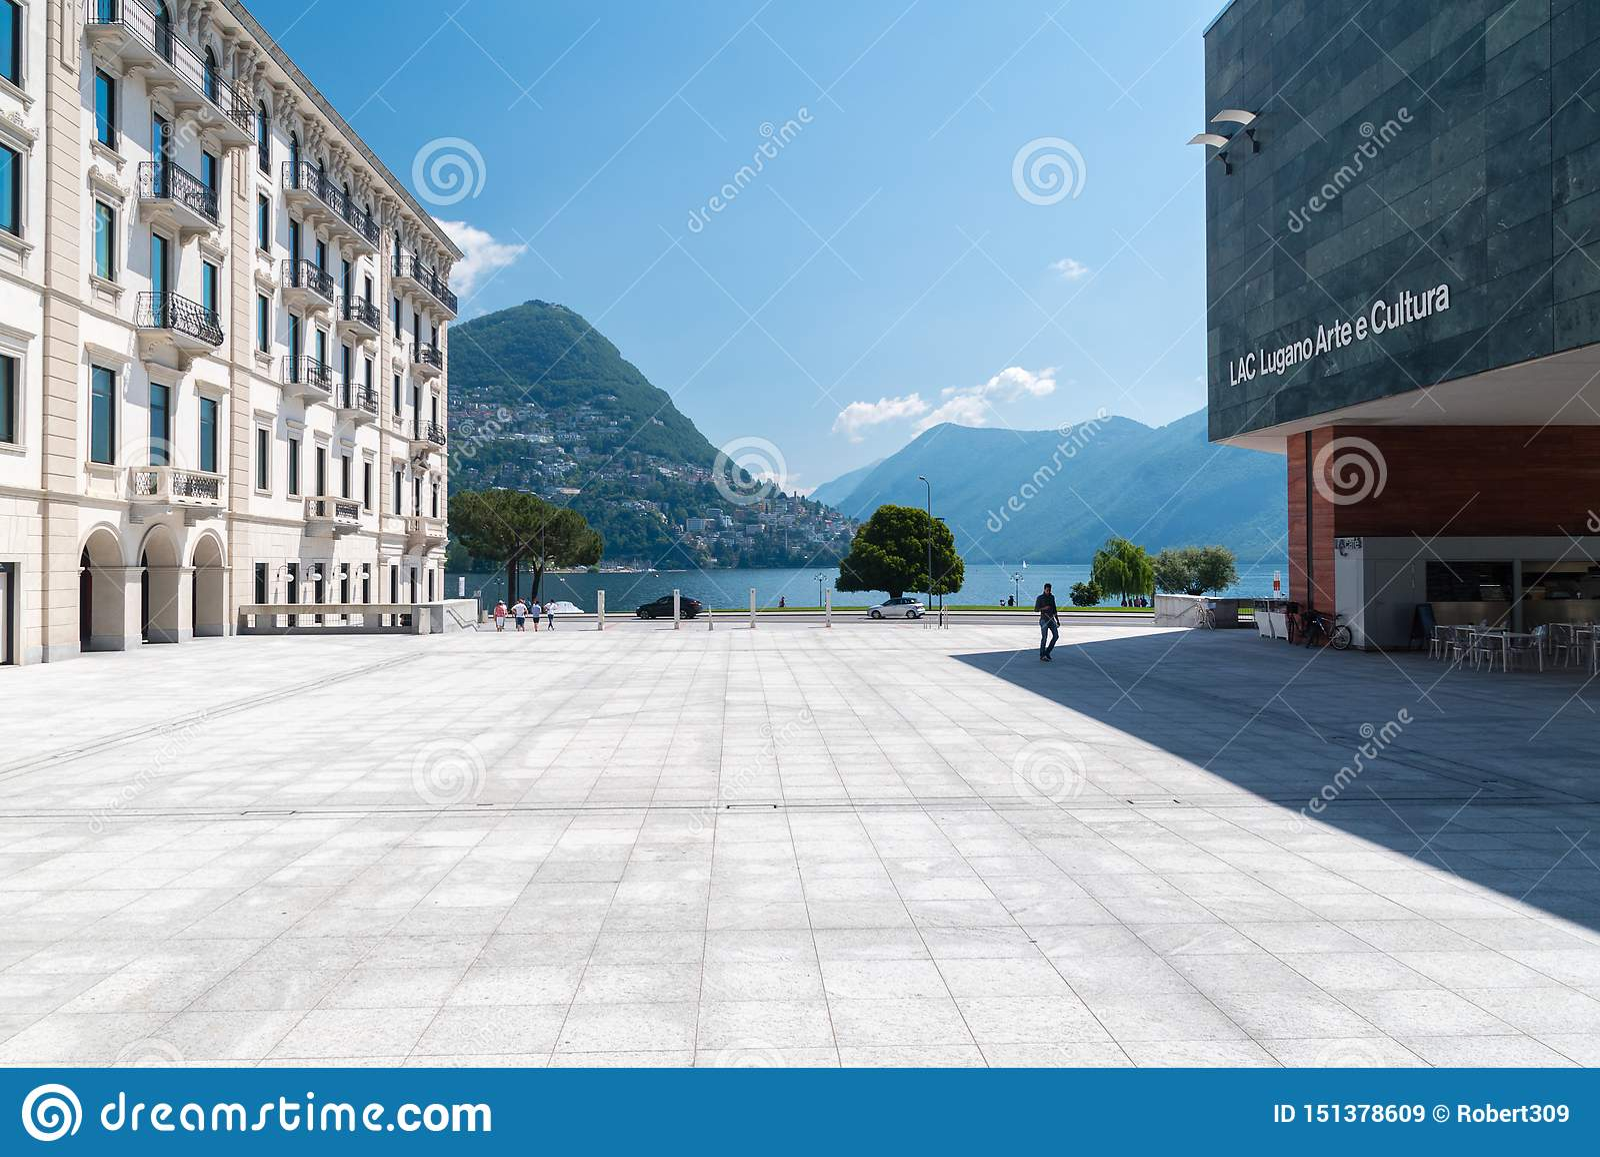 Vue de place à la LAQUE Lugano Arte e Cultura